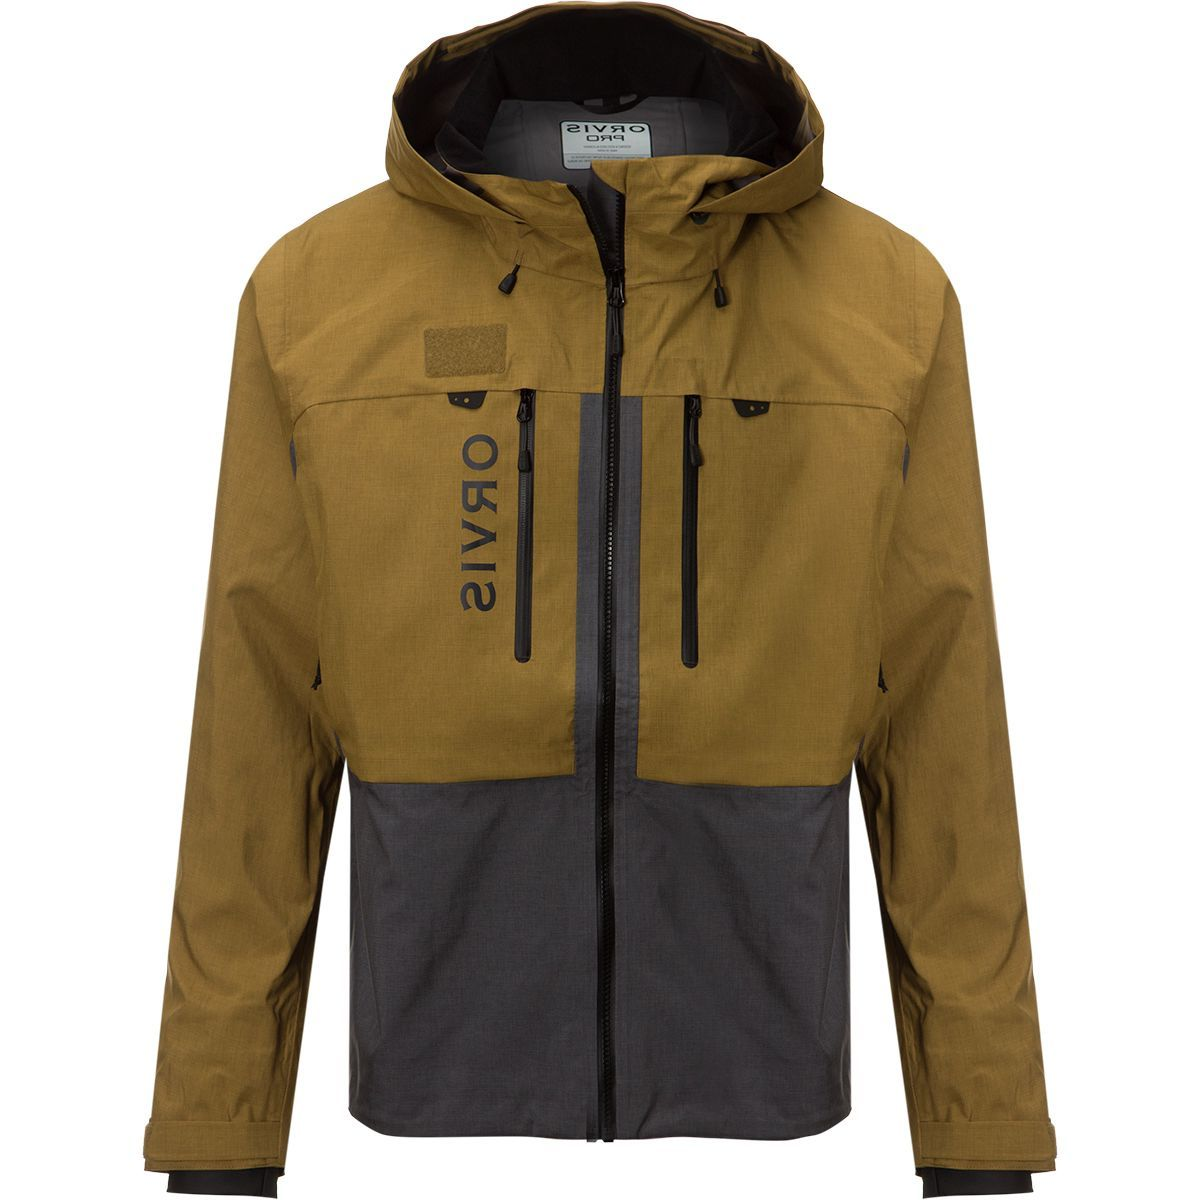 Orvis Pro Wading Jacket - Men's